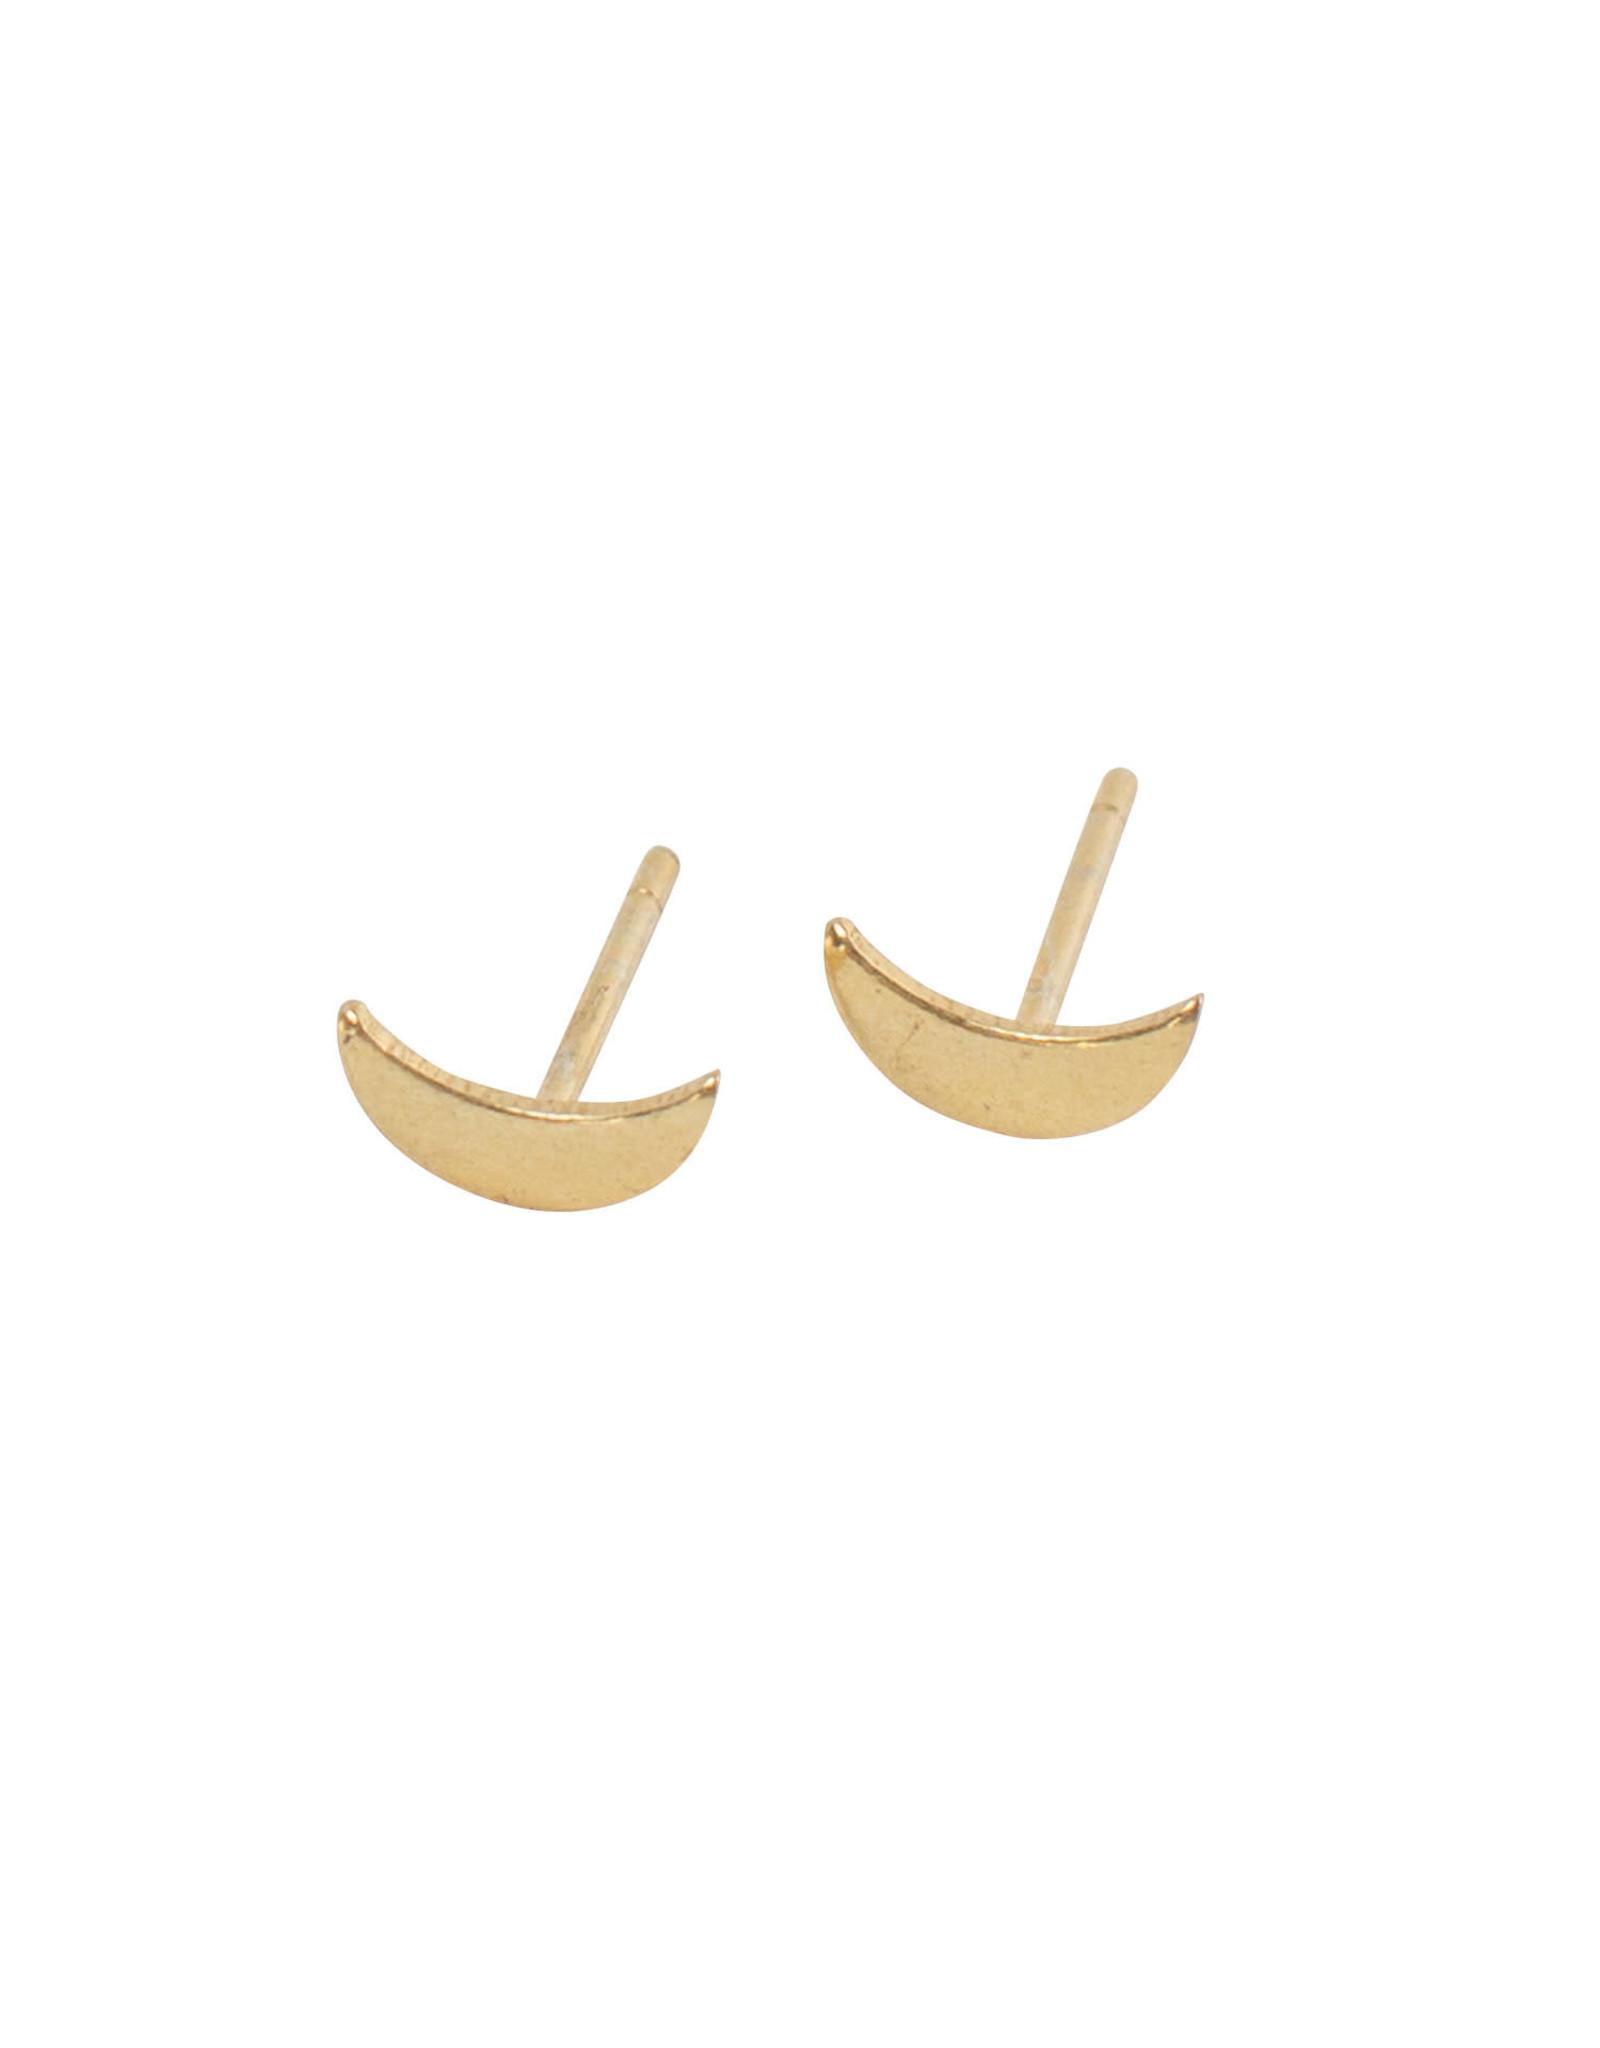 TTV USA Crescent Moon Earrings, India